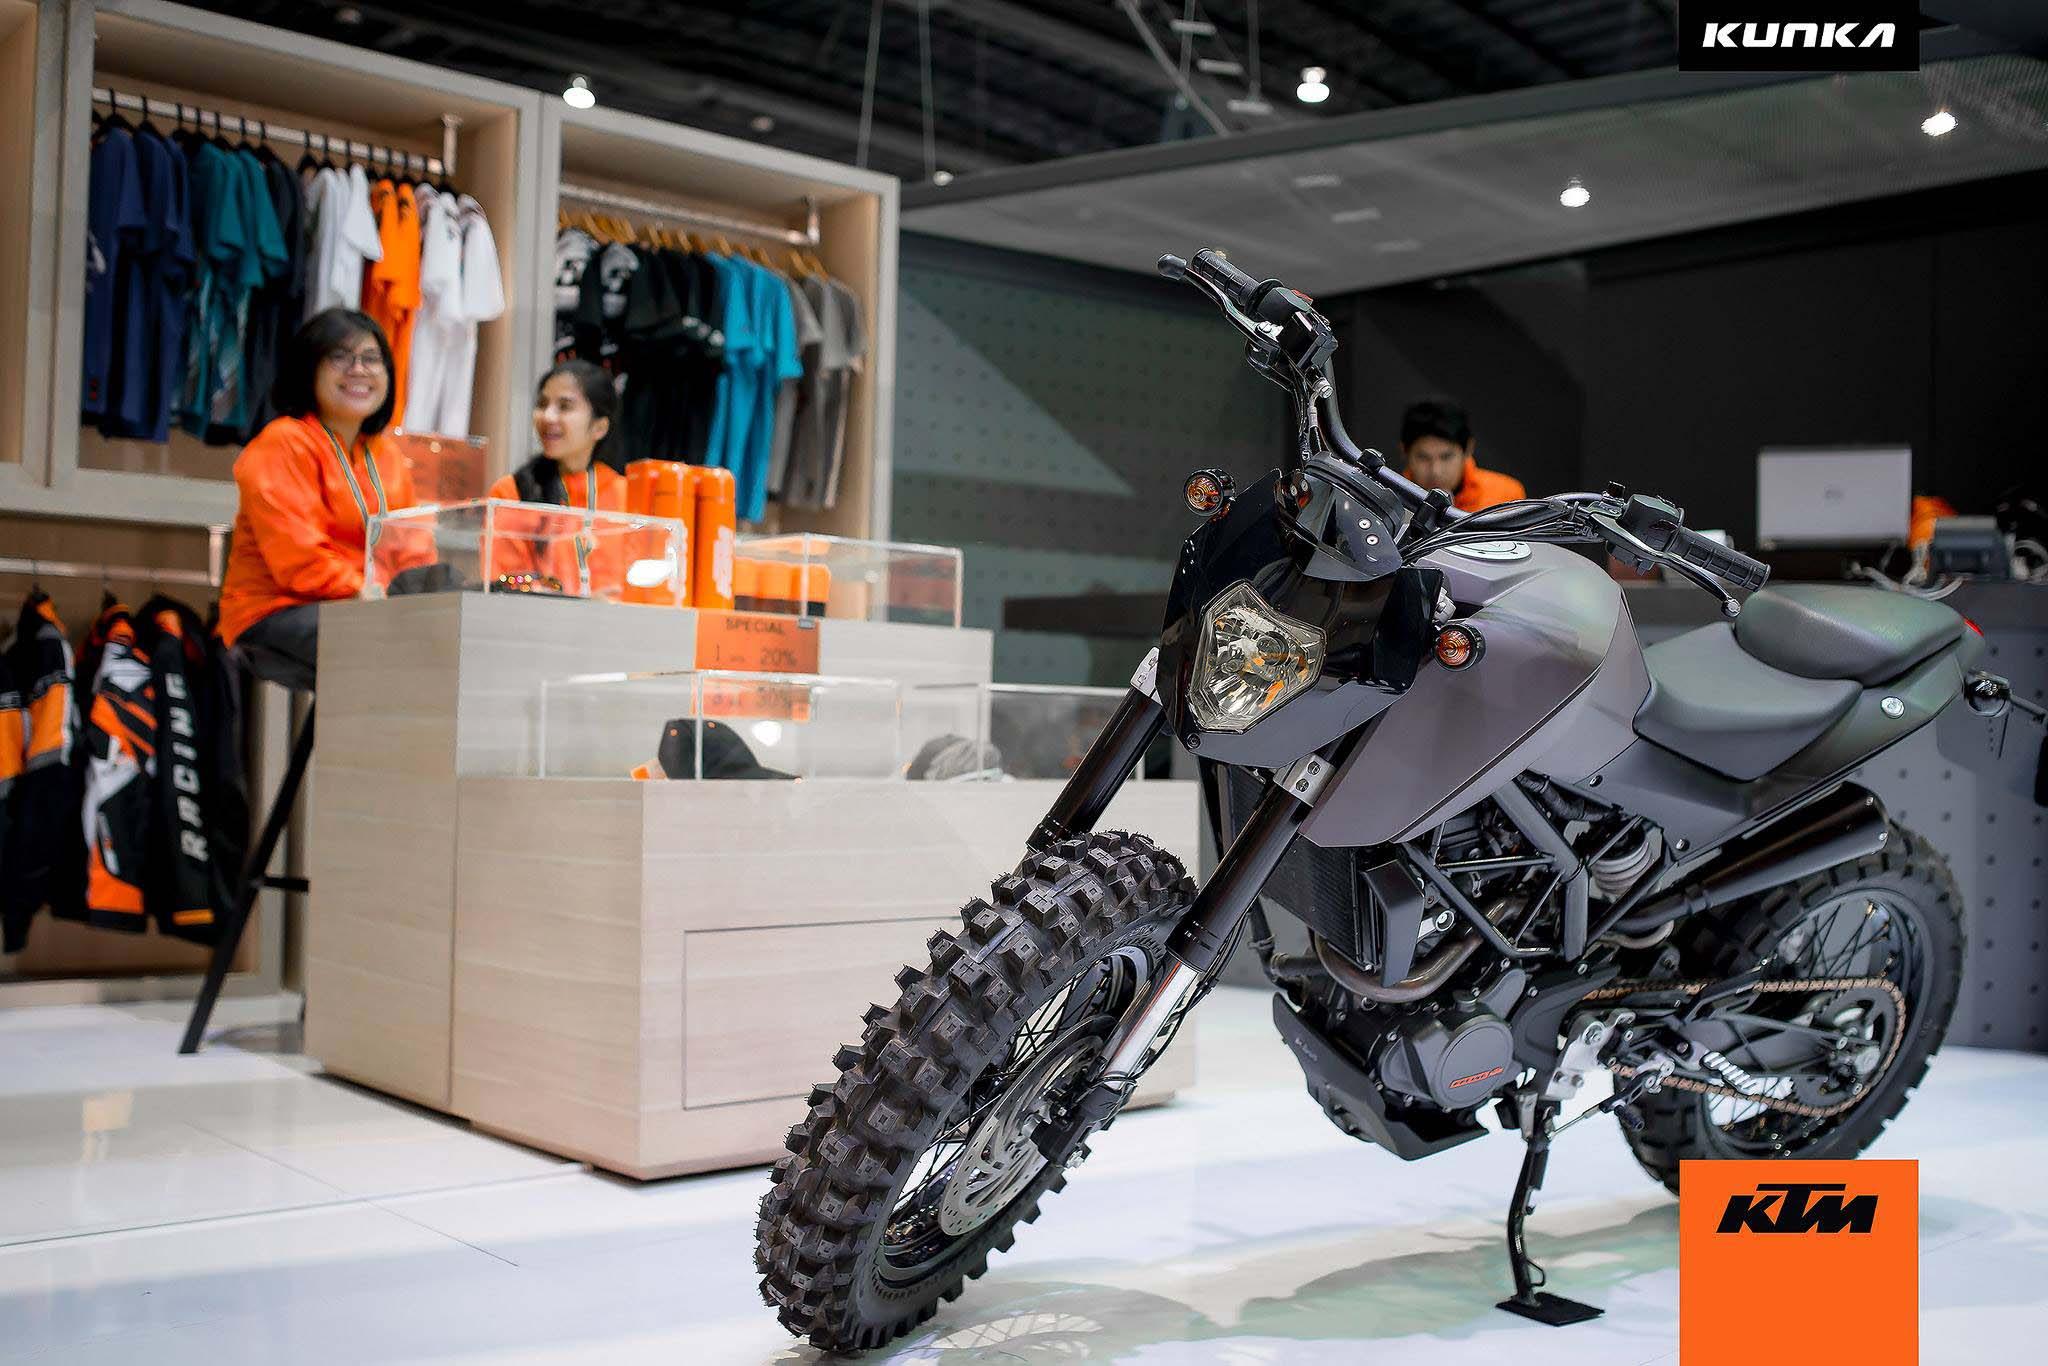 Ktm Dual Sport >> KTM 200 Duke-T Concepts by Kunka - Asphalt & Rubber